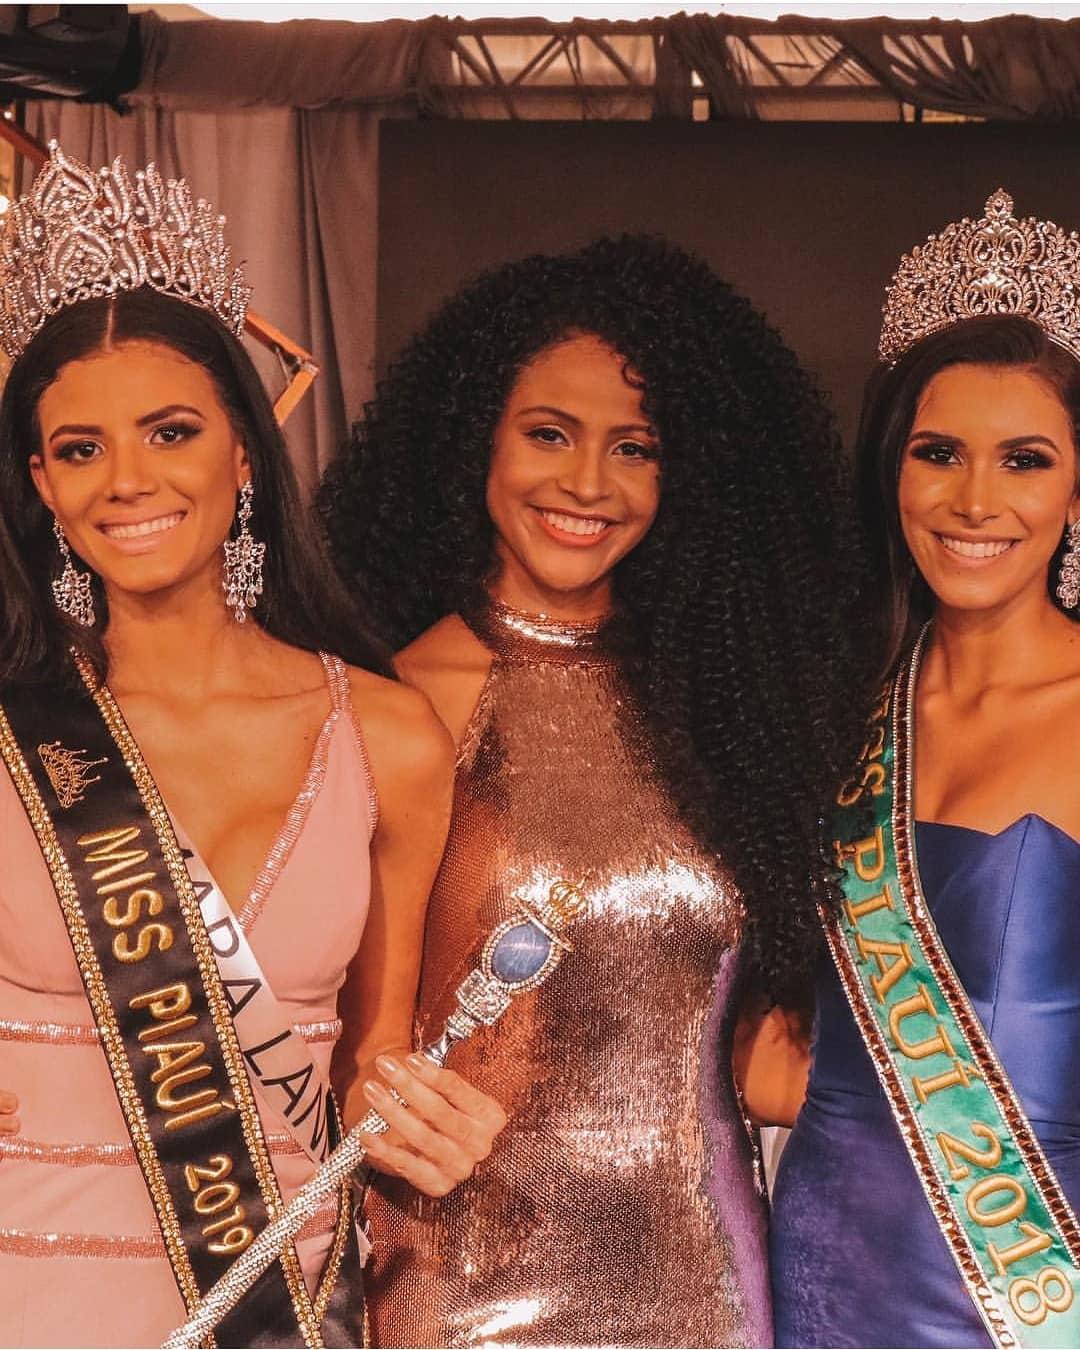 dagmara landim, top 10 de miss brasil universo 2019. - Página 3 50998110